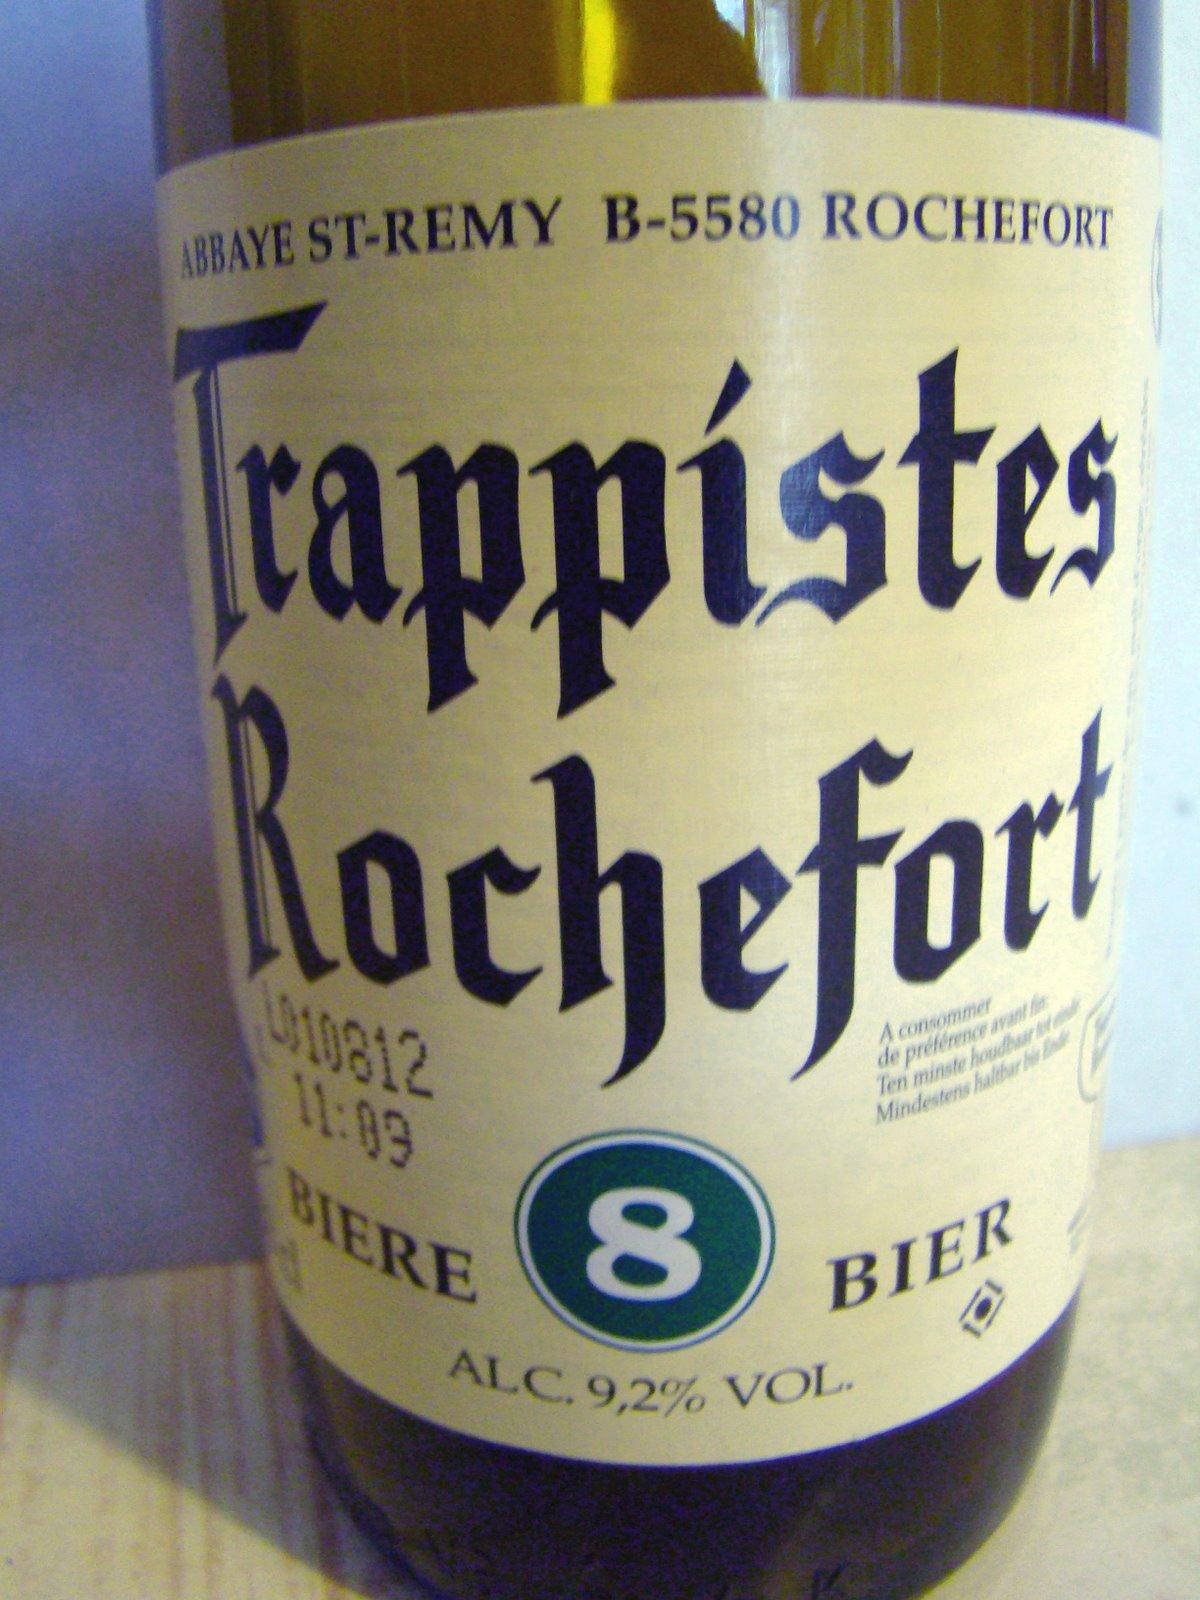 Trappistes - Rochefort